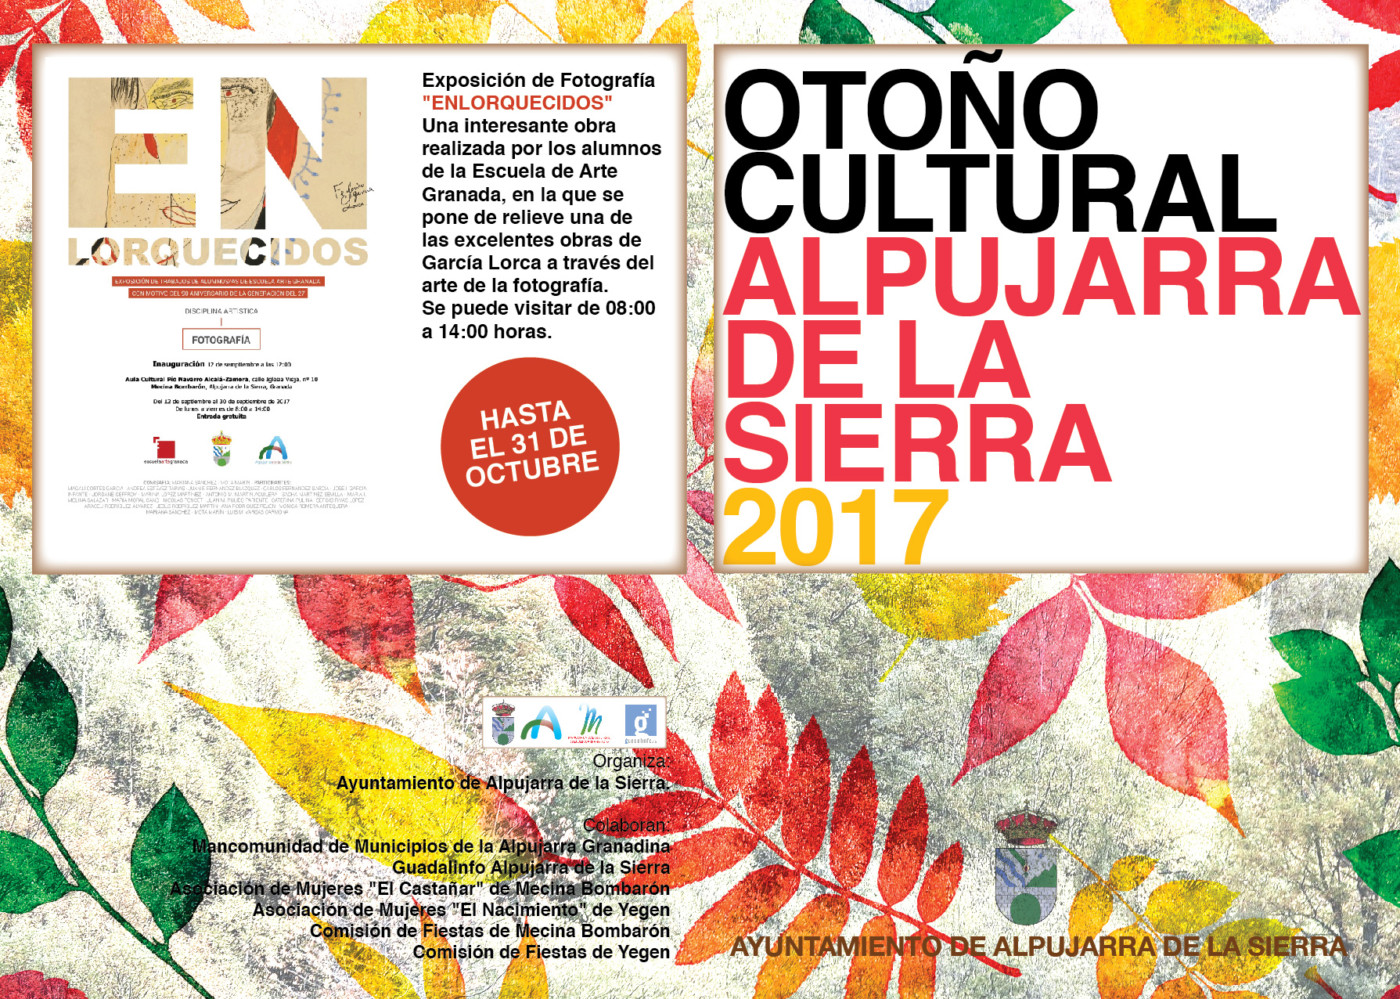 Otoño cultural 2017